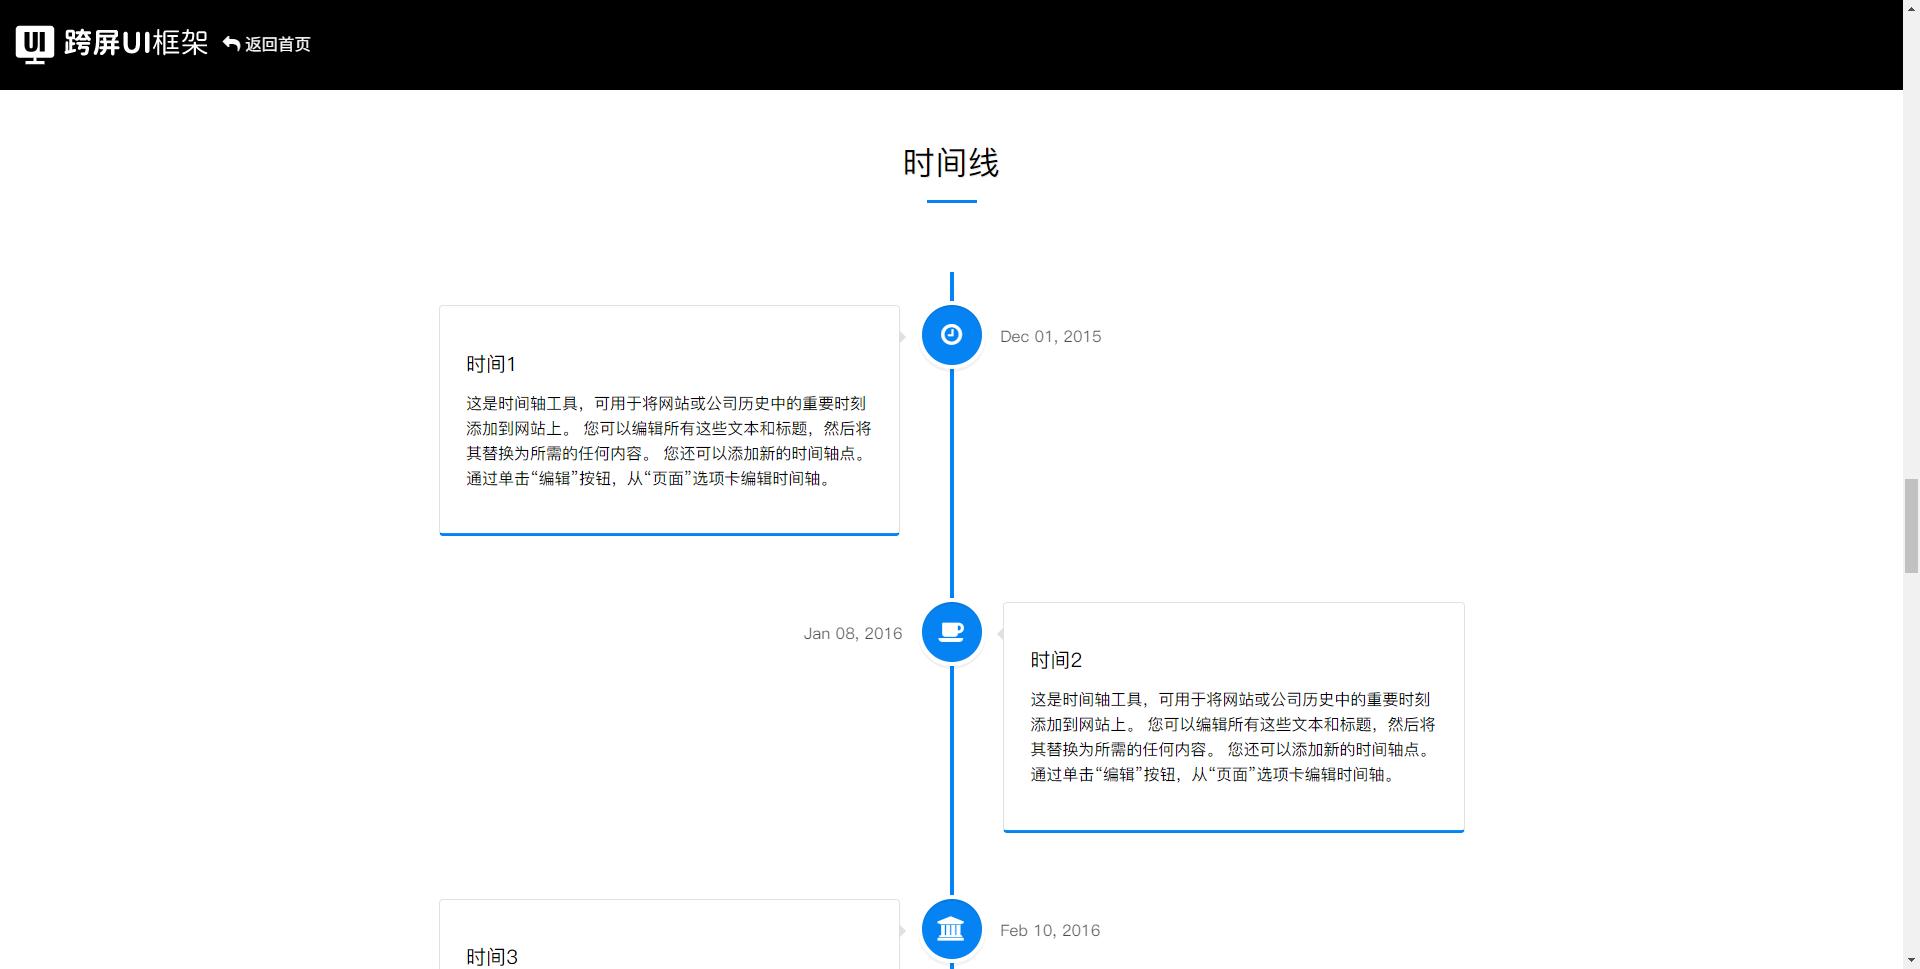 kuapingUI 1.6 版本发布,跨屏 UI-bootstrap 大组件 ui 框架